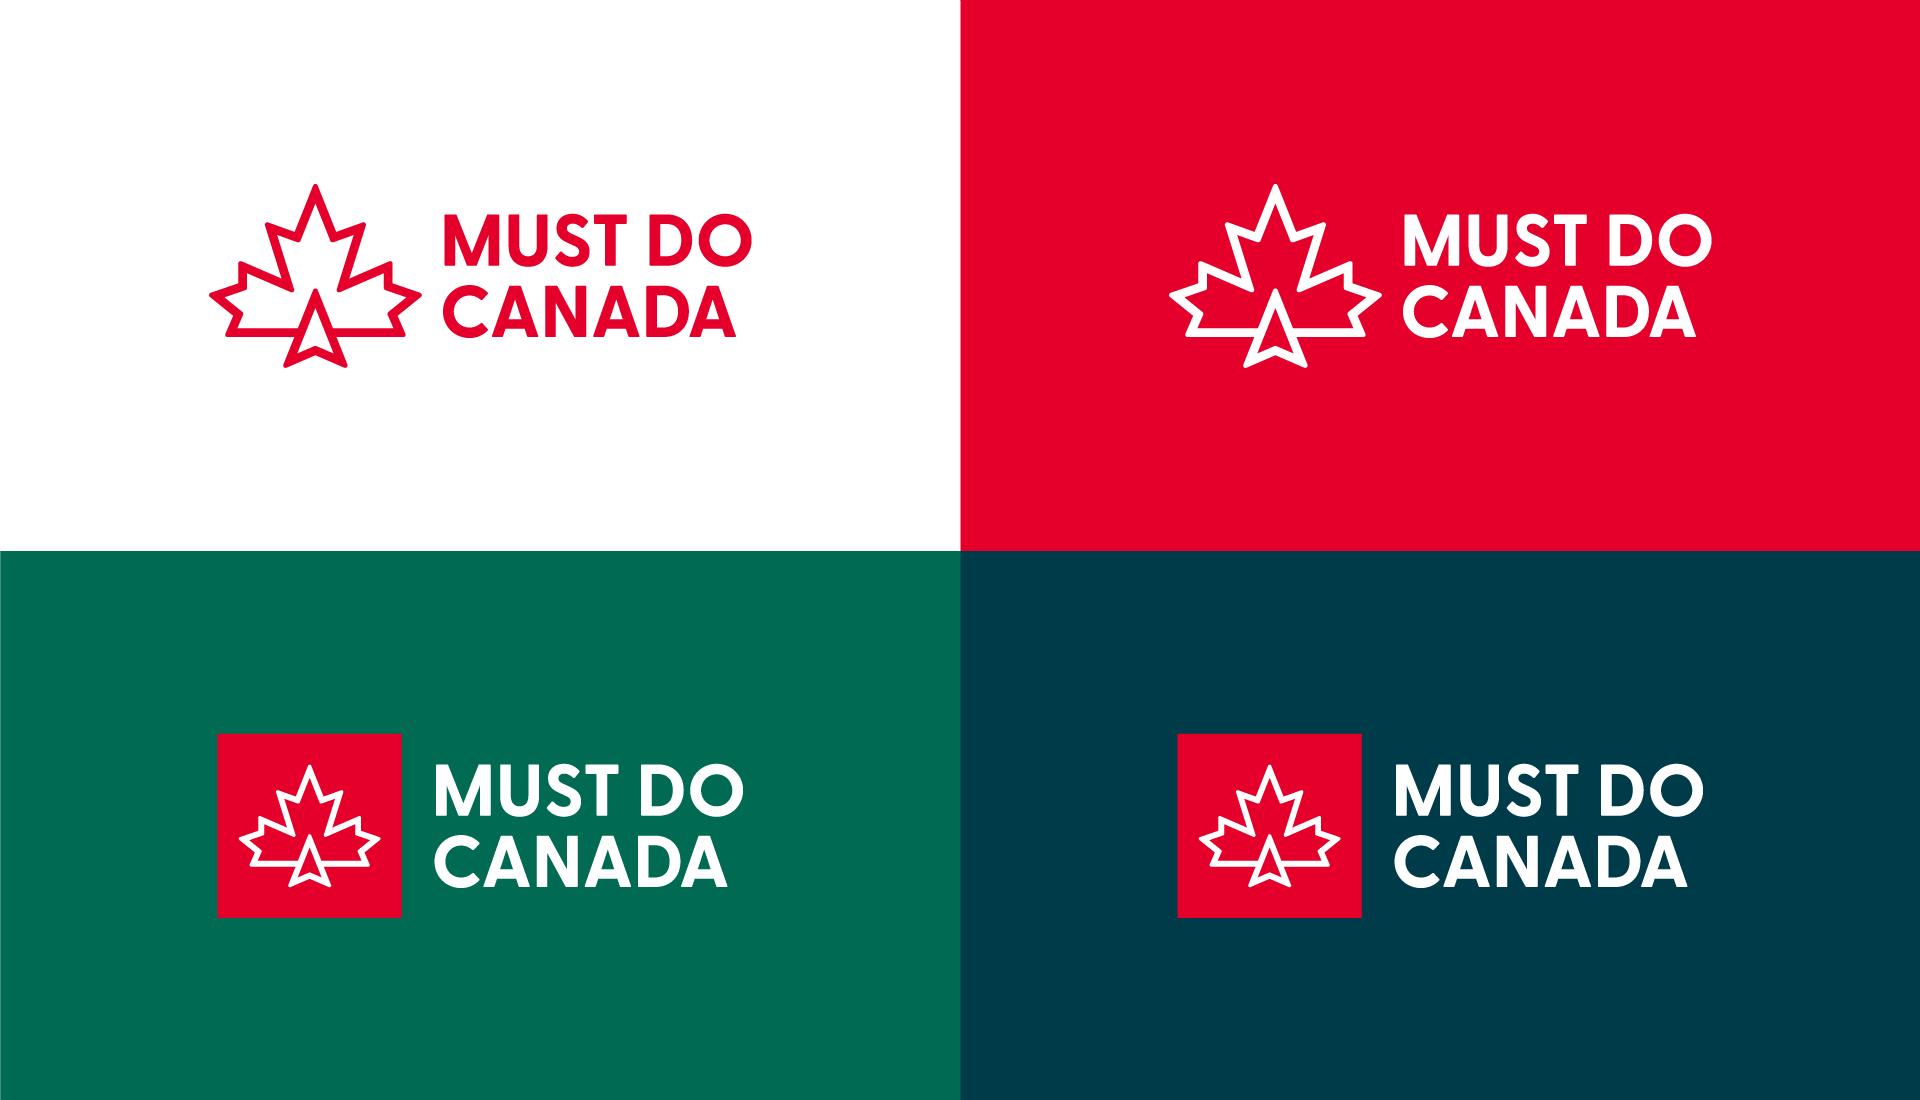 must-do-canada-logos-colours